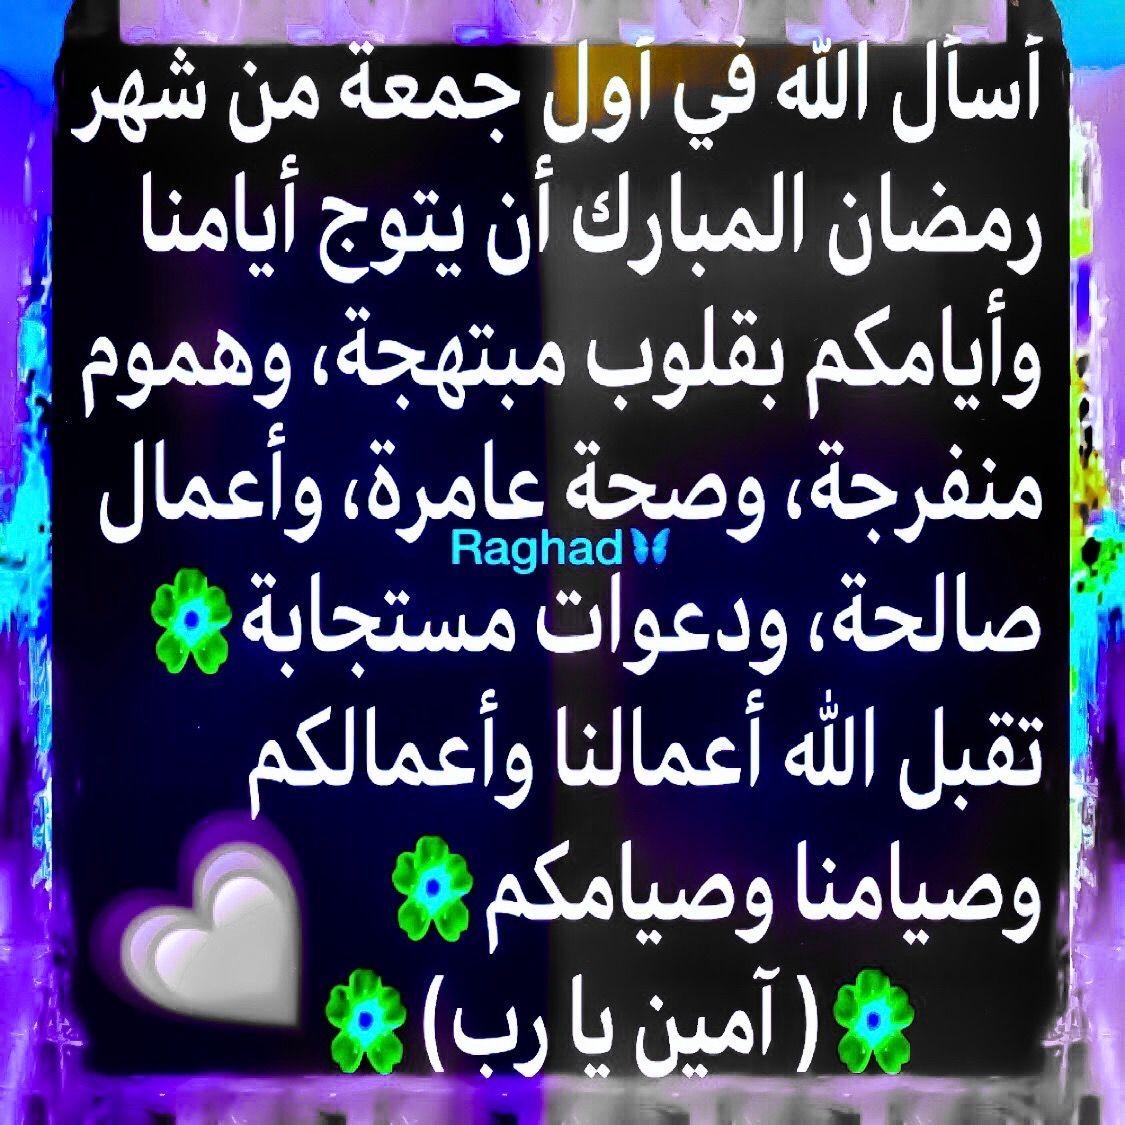 Desertrose أسأل الله في أول جمعة من شهر رمضان المبارك أن يتوج أيامنا وأيامكم بقلوب مبتهجة وهموم منفرجة وصحة عامرة وأعمال Ramadan Kareem Ramadan Kareem